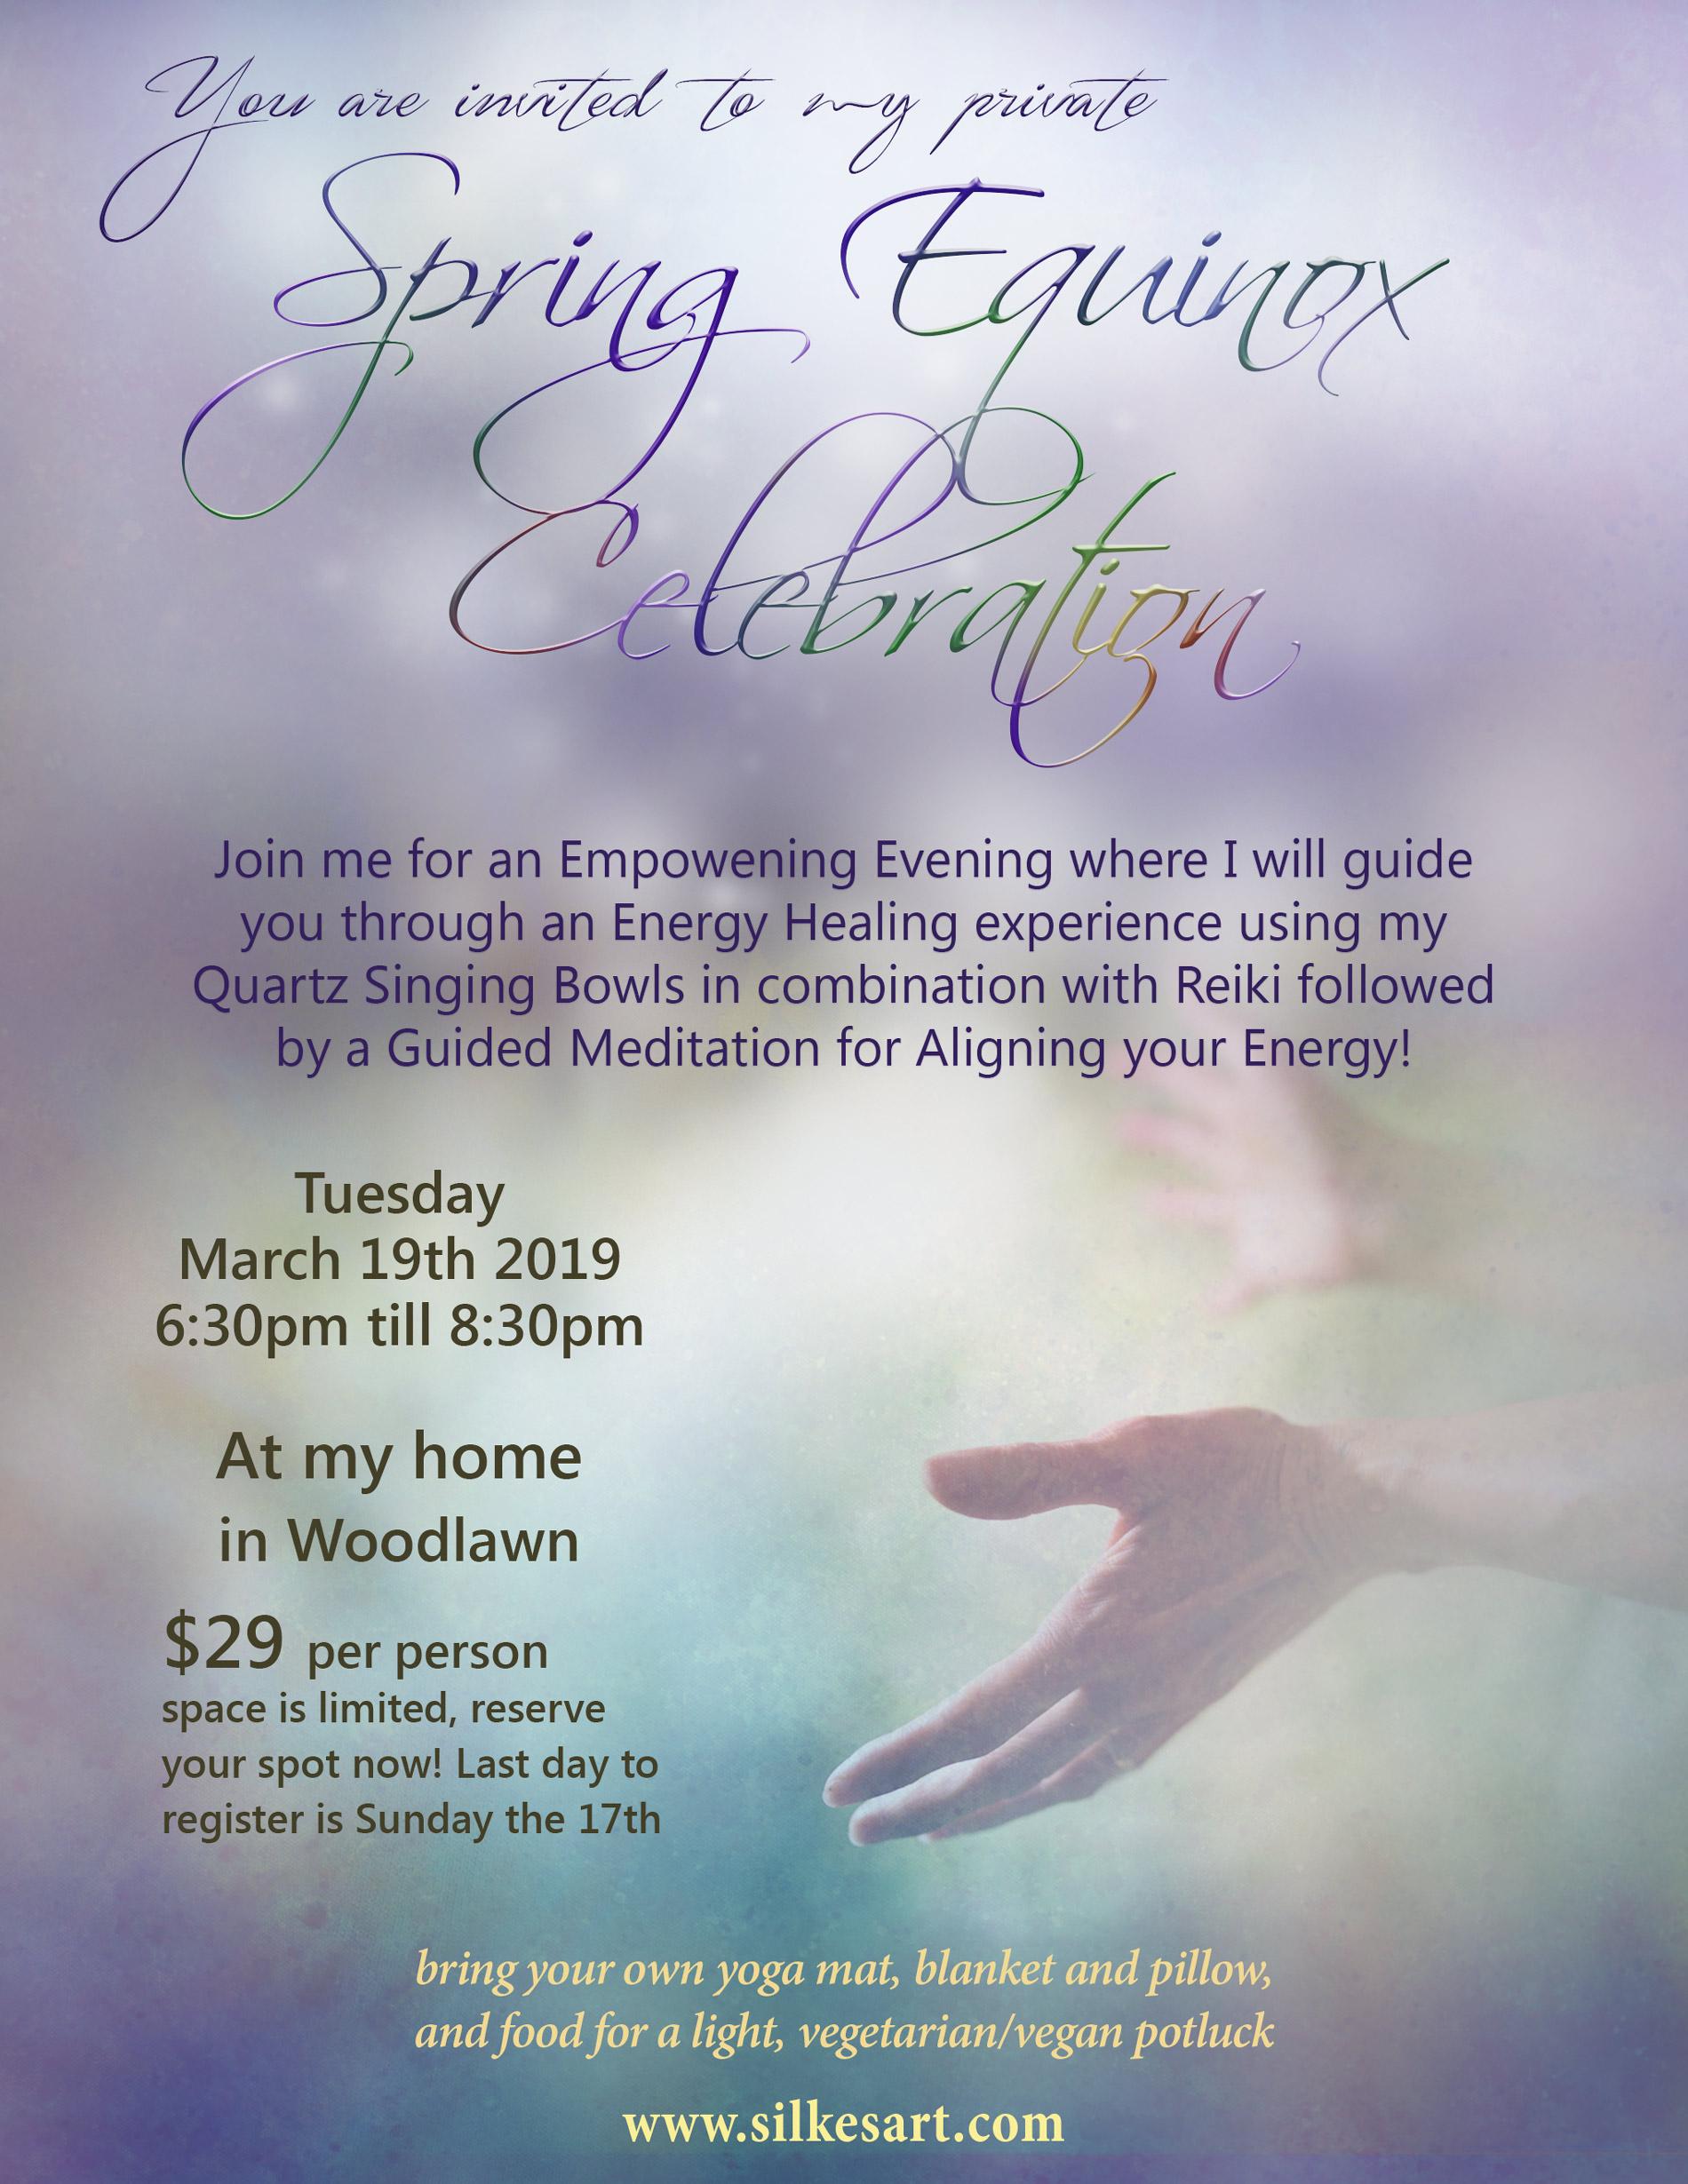 Spring-Equinox-Celebration.jpg